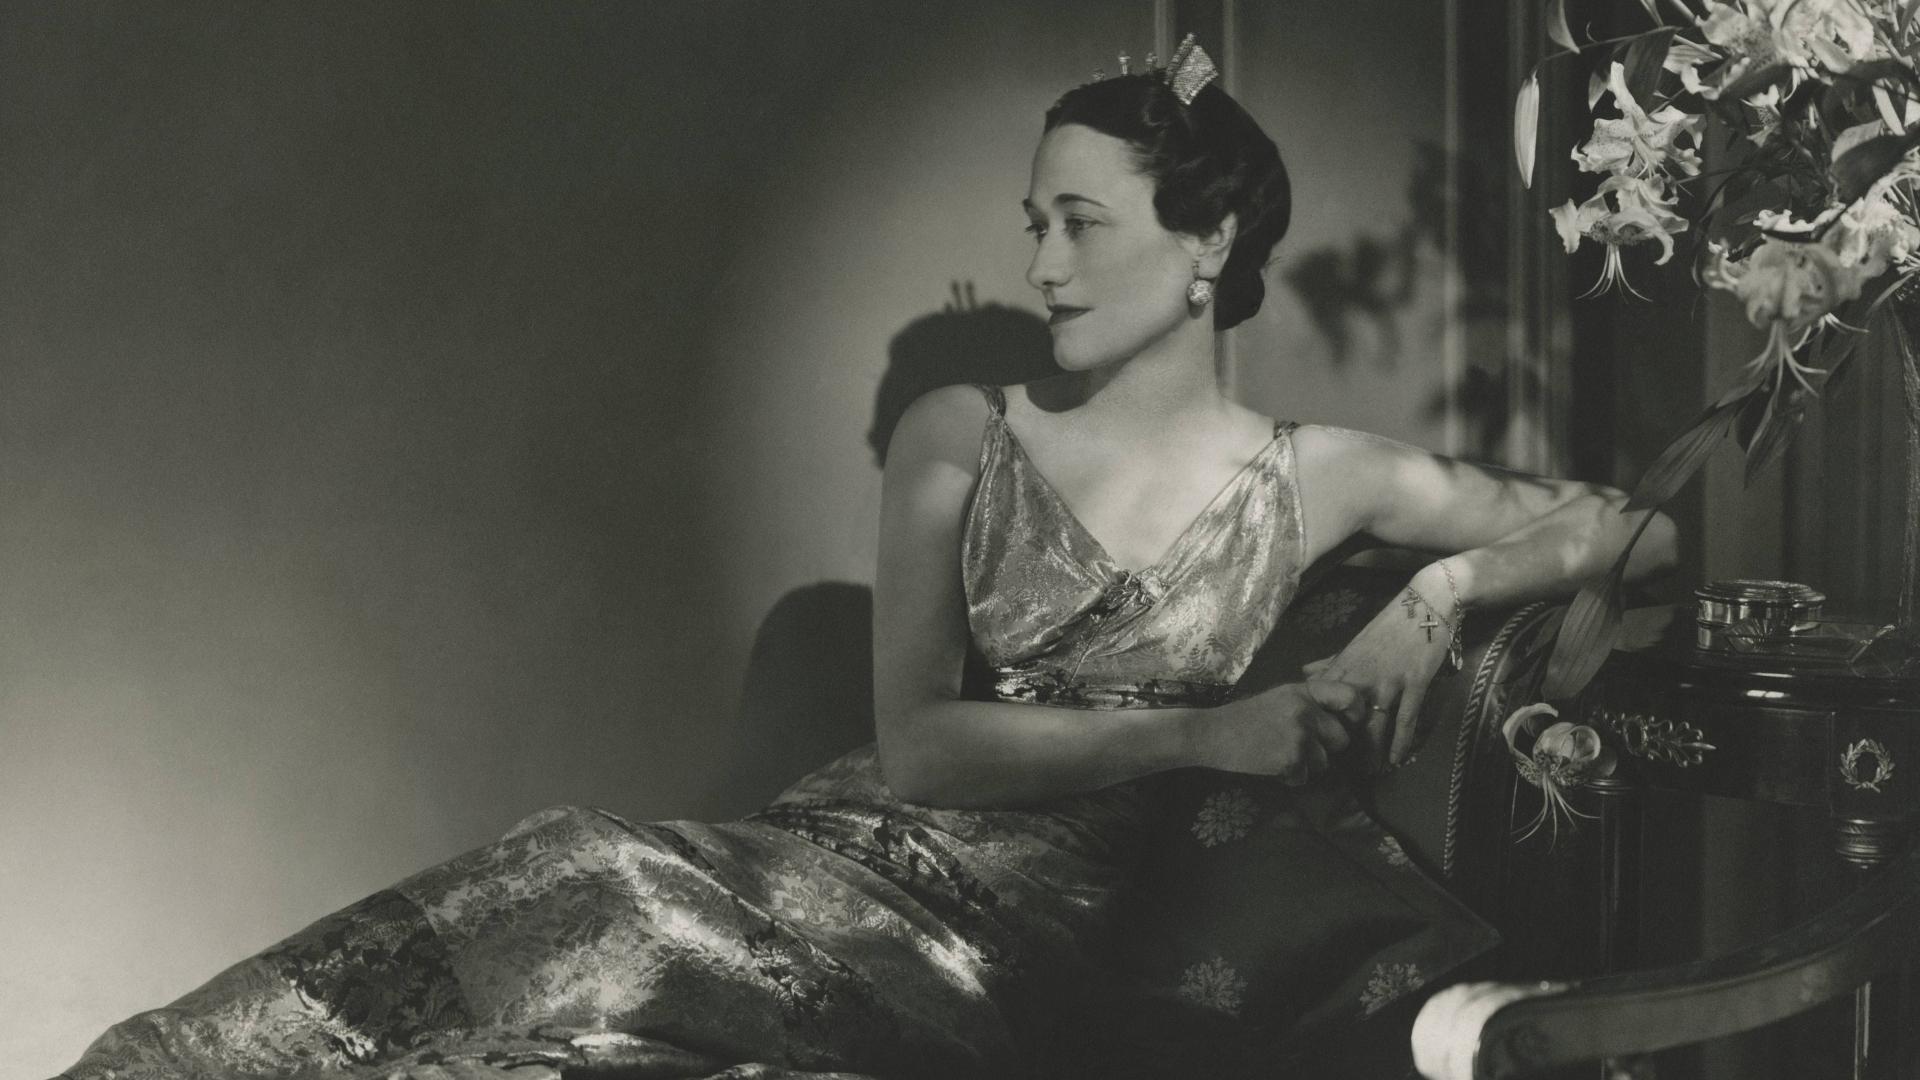 The Duchess of Windsor, Wallis Simpson. (Credit: Horst P. Horst/Condé Nast via Getty Images)